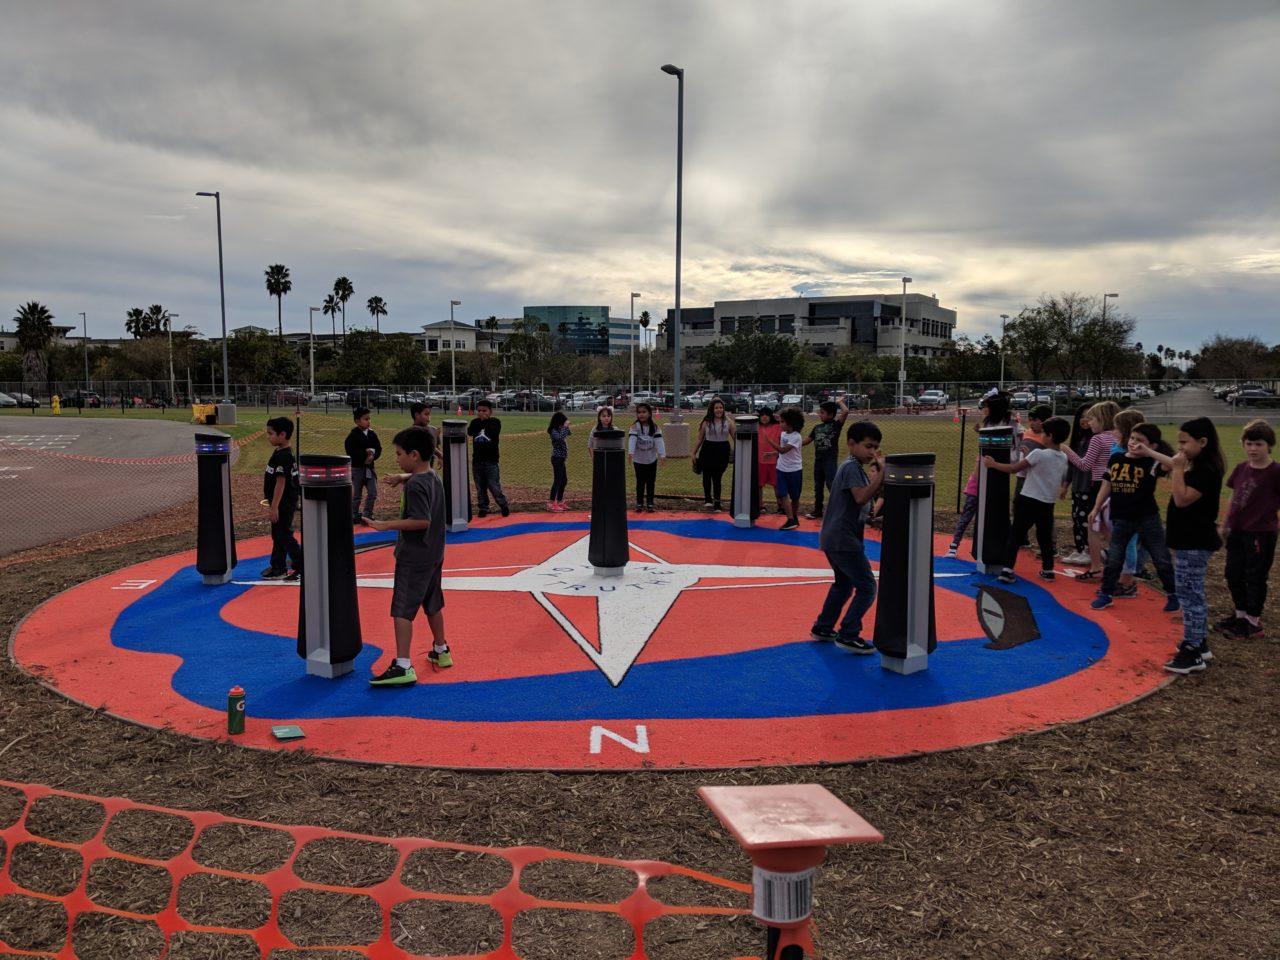 Yalp Memo - Rio del Sol STEAM school